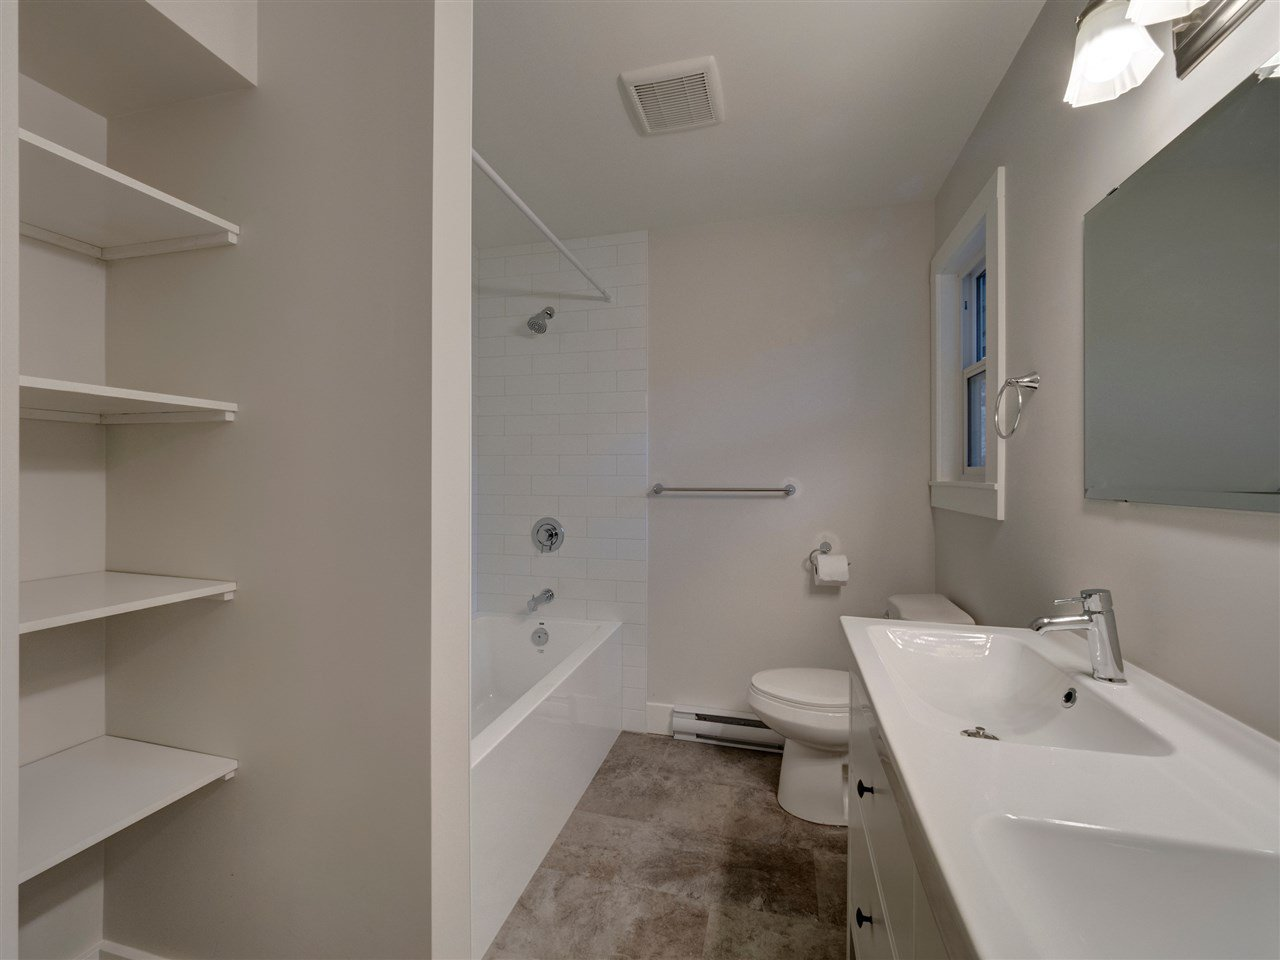 Photo 18: Photos: 1085 ROBERTS CREEK Road: Roberts Creek House for sale (Sunshine Coast)  : MLS®# R2392415